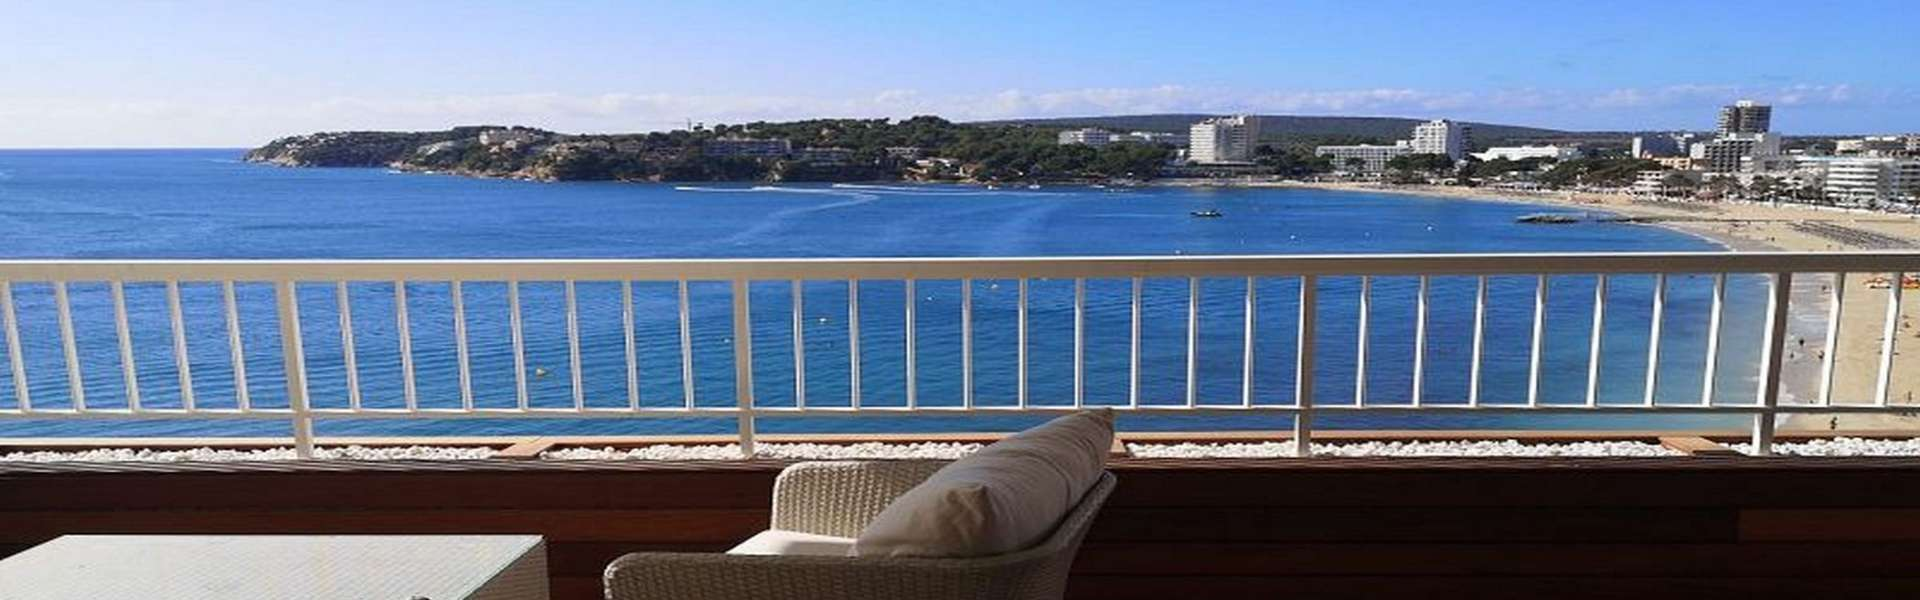 Calvia/Torrenova - Renoviertes Apartment direkt am Meer